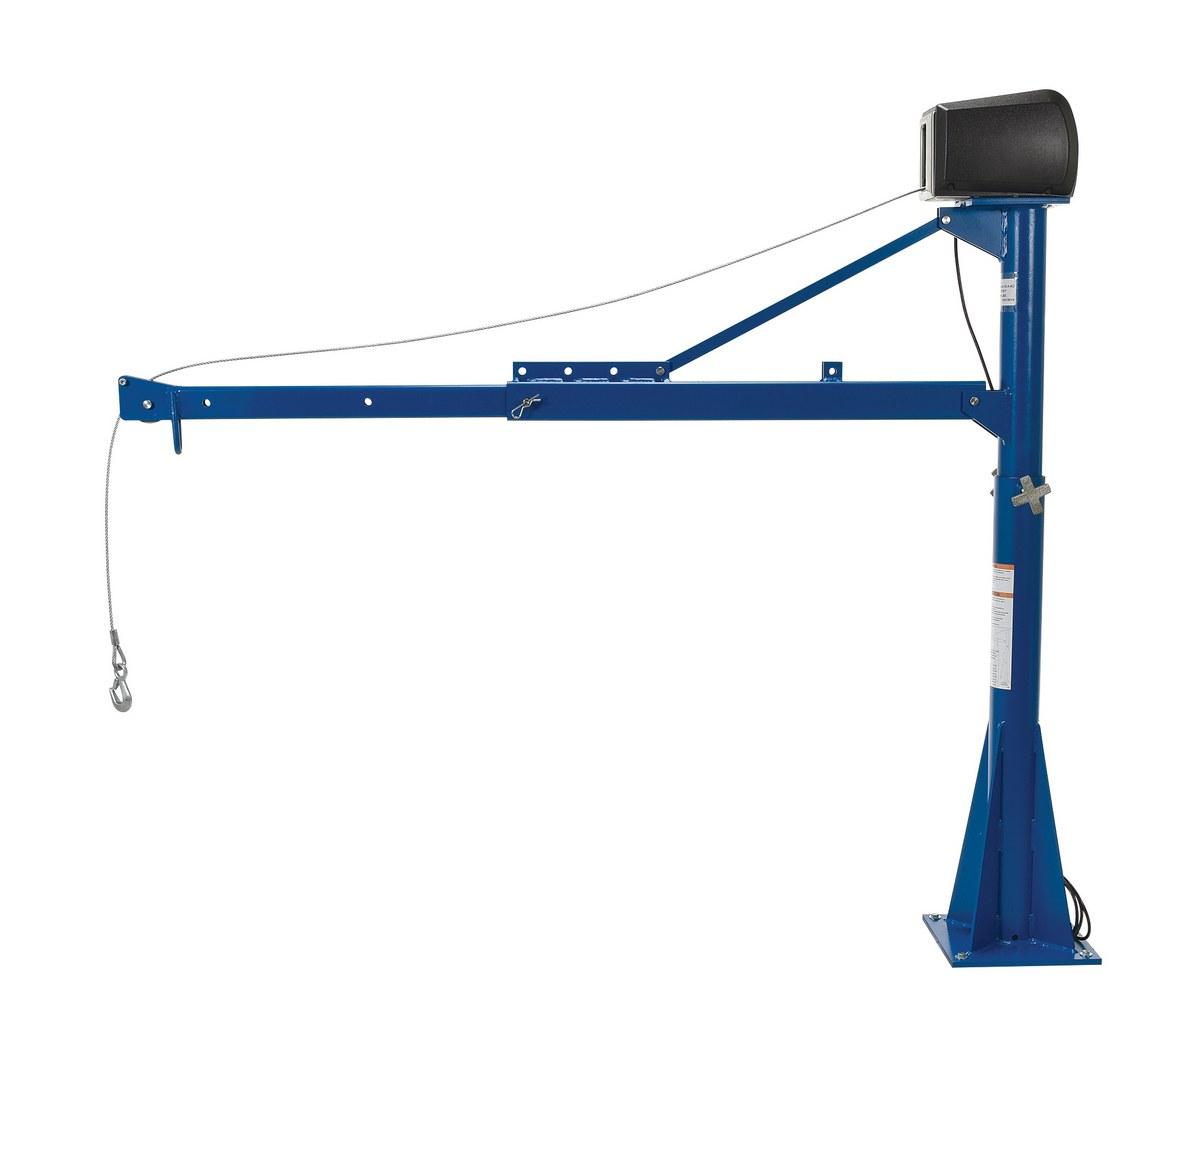 Power Lift Jib Cranes - Product Page